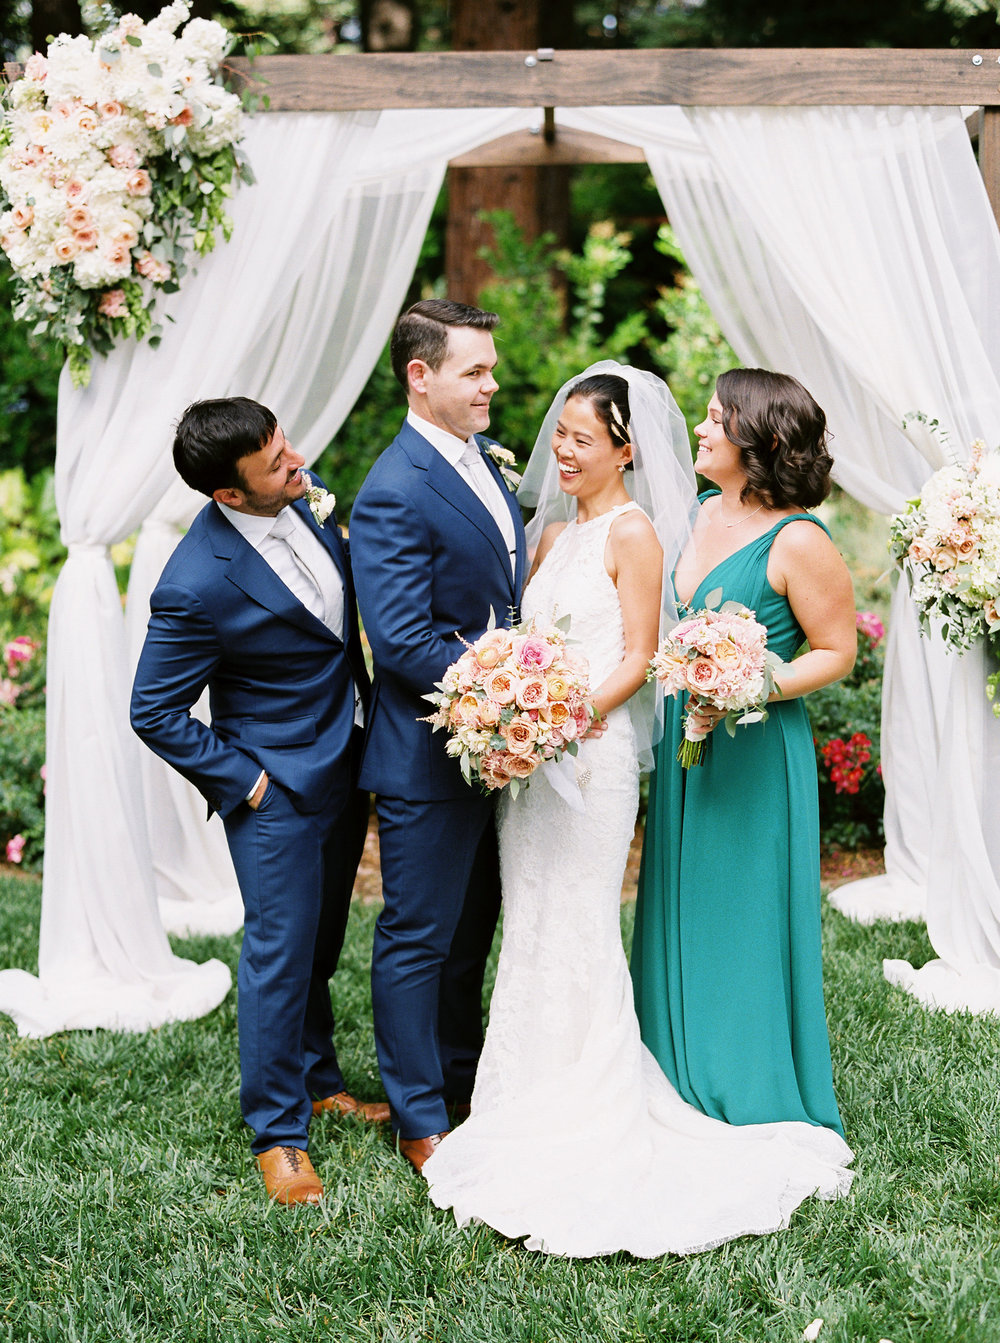 Harvest-inn-wedding-in-napa-california-37.jpg